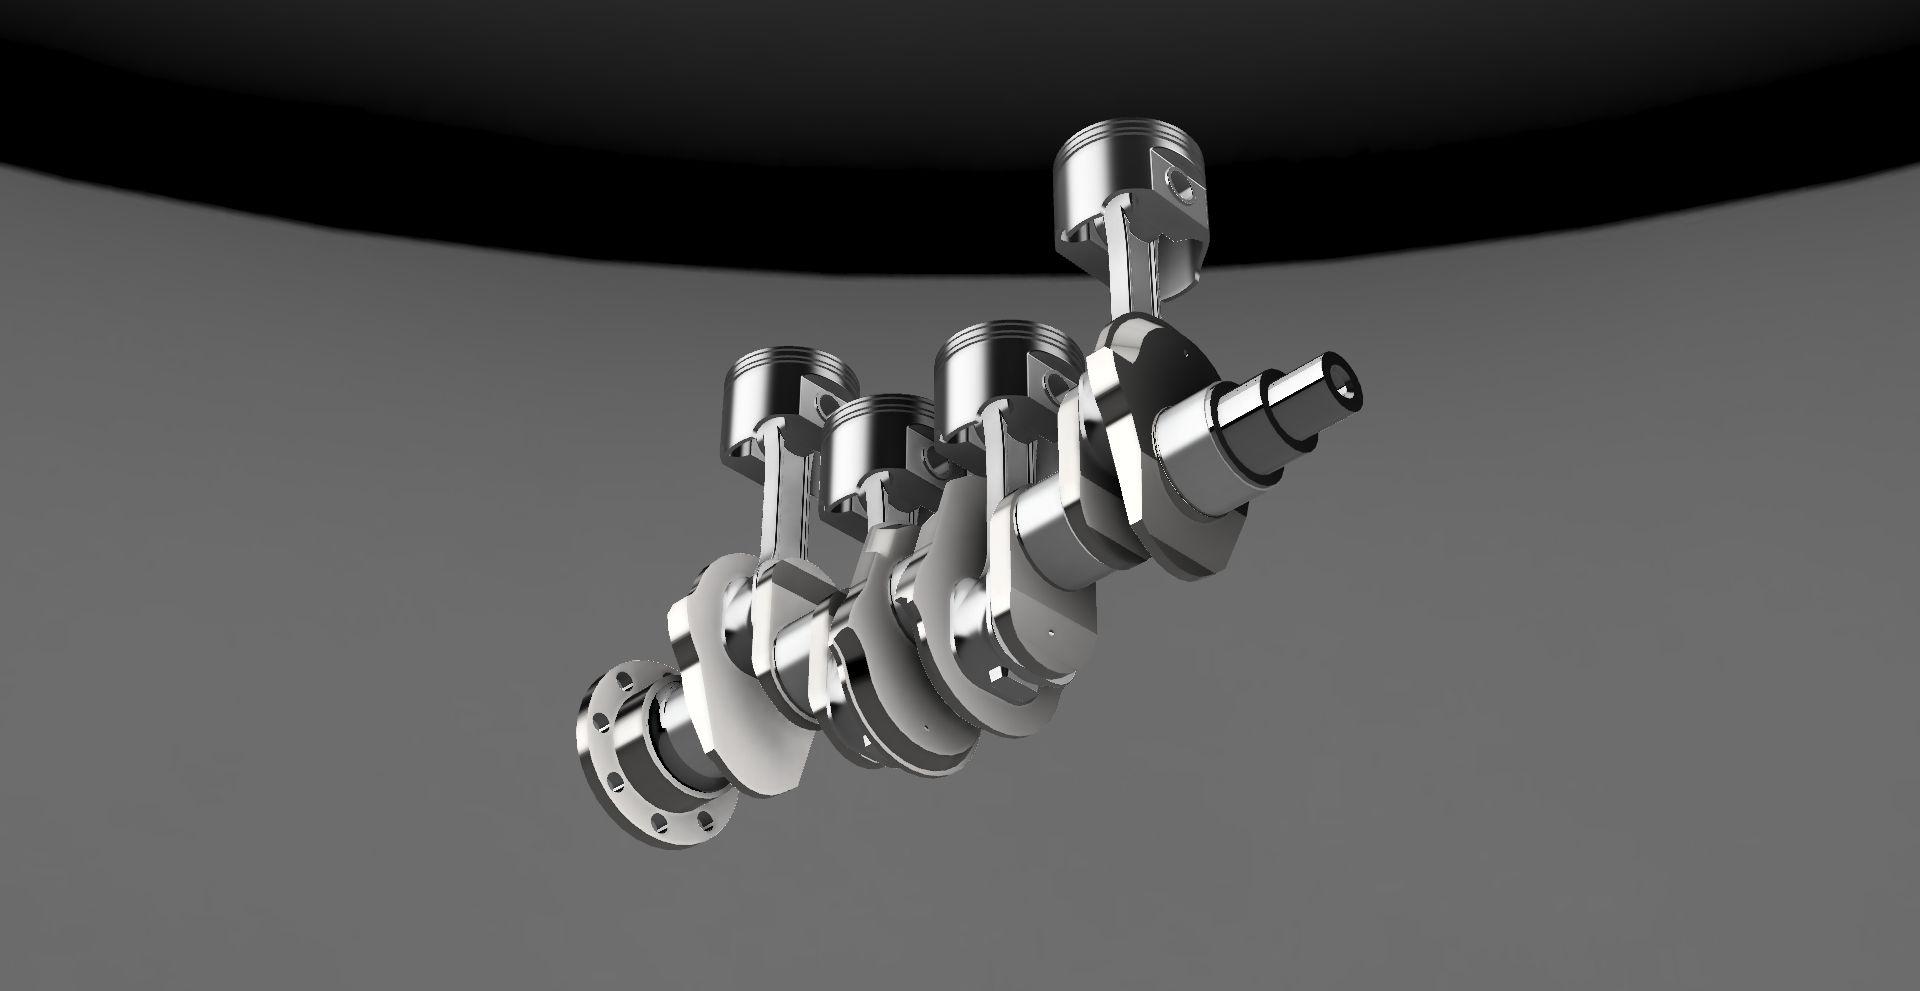 Engine-model-v12-3-3500-3500